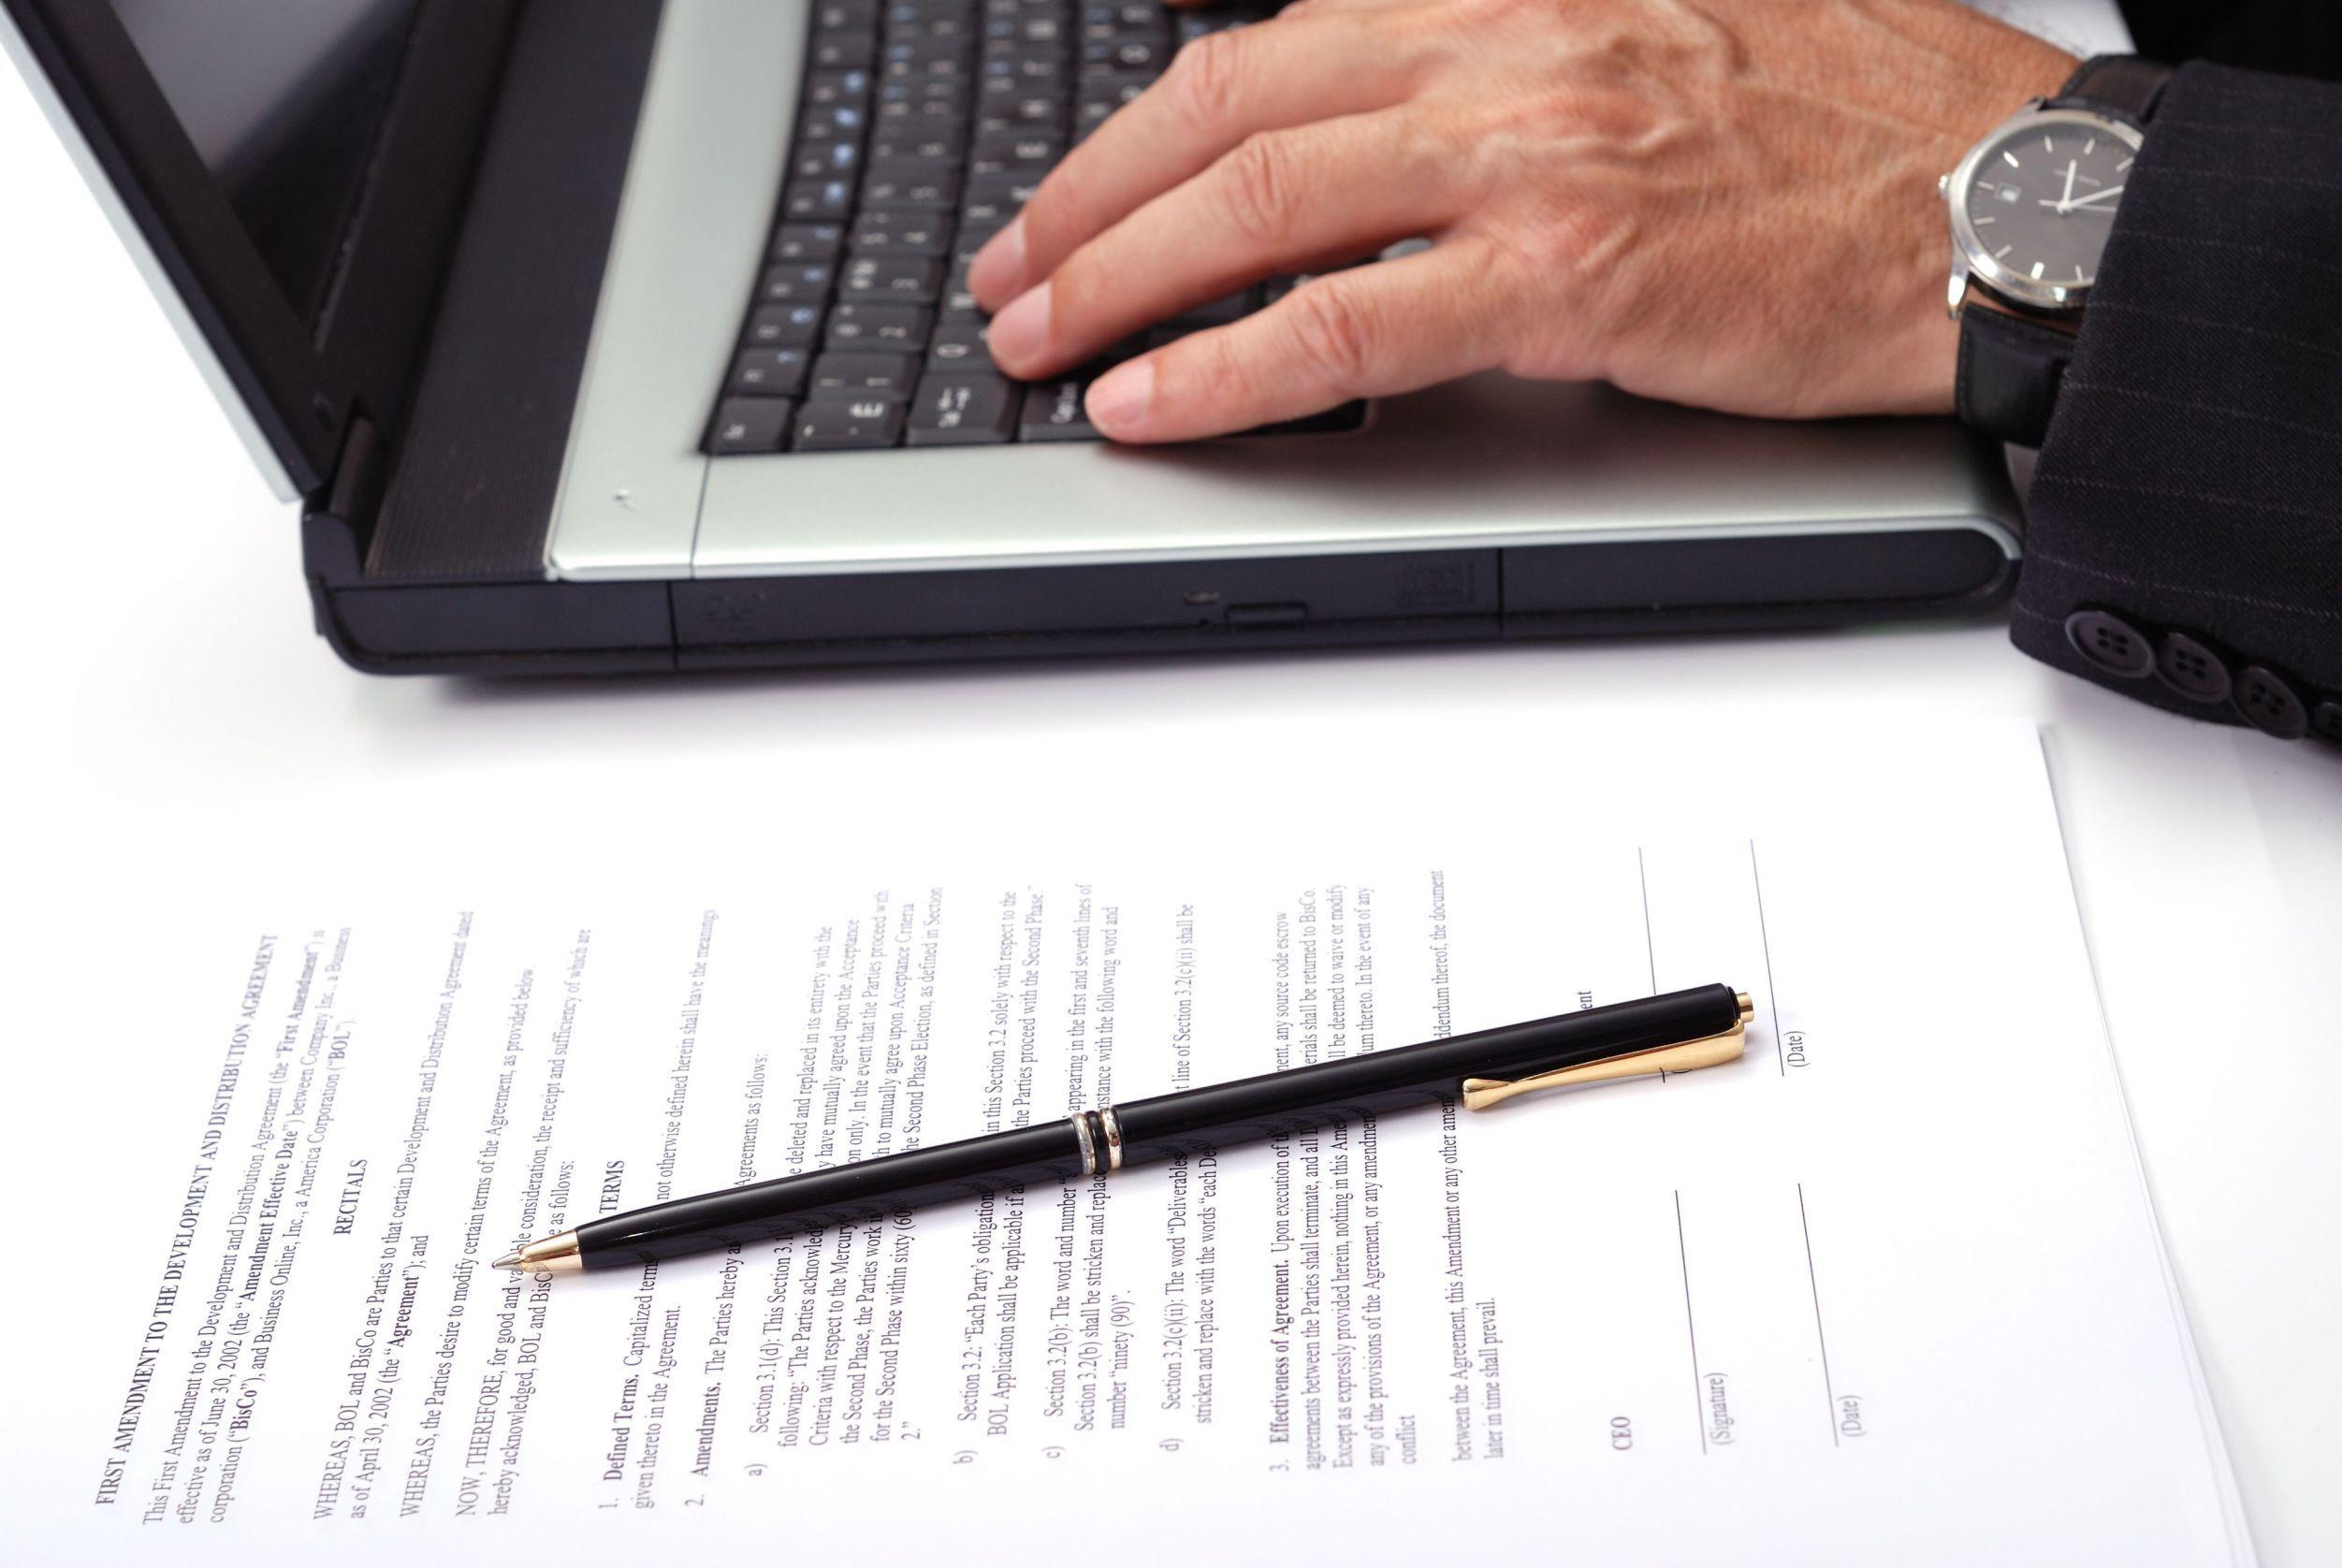 Top 10 Keywords For Writing Impressive Resume   Job Search Ideas ...